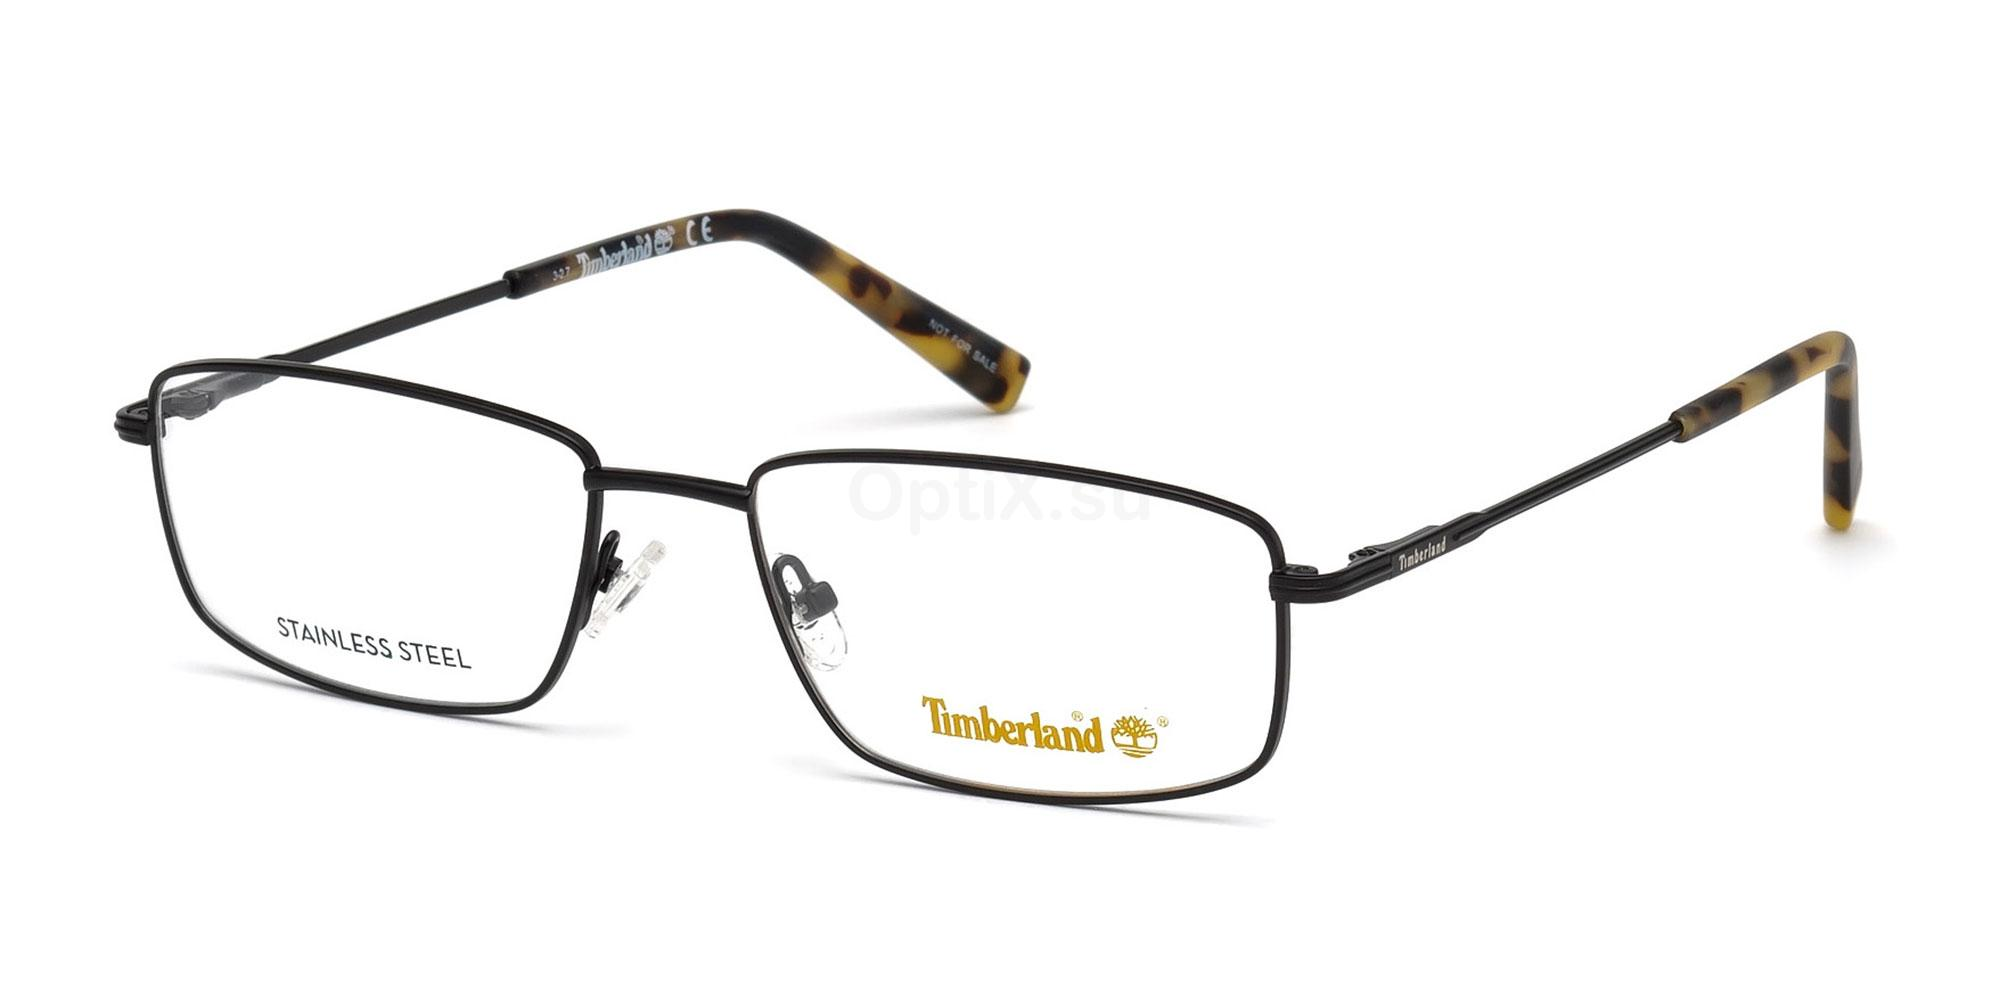 002 TB1607 Glasses, Timberland